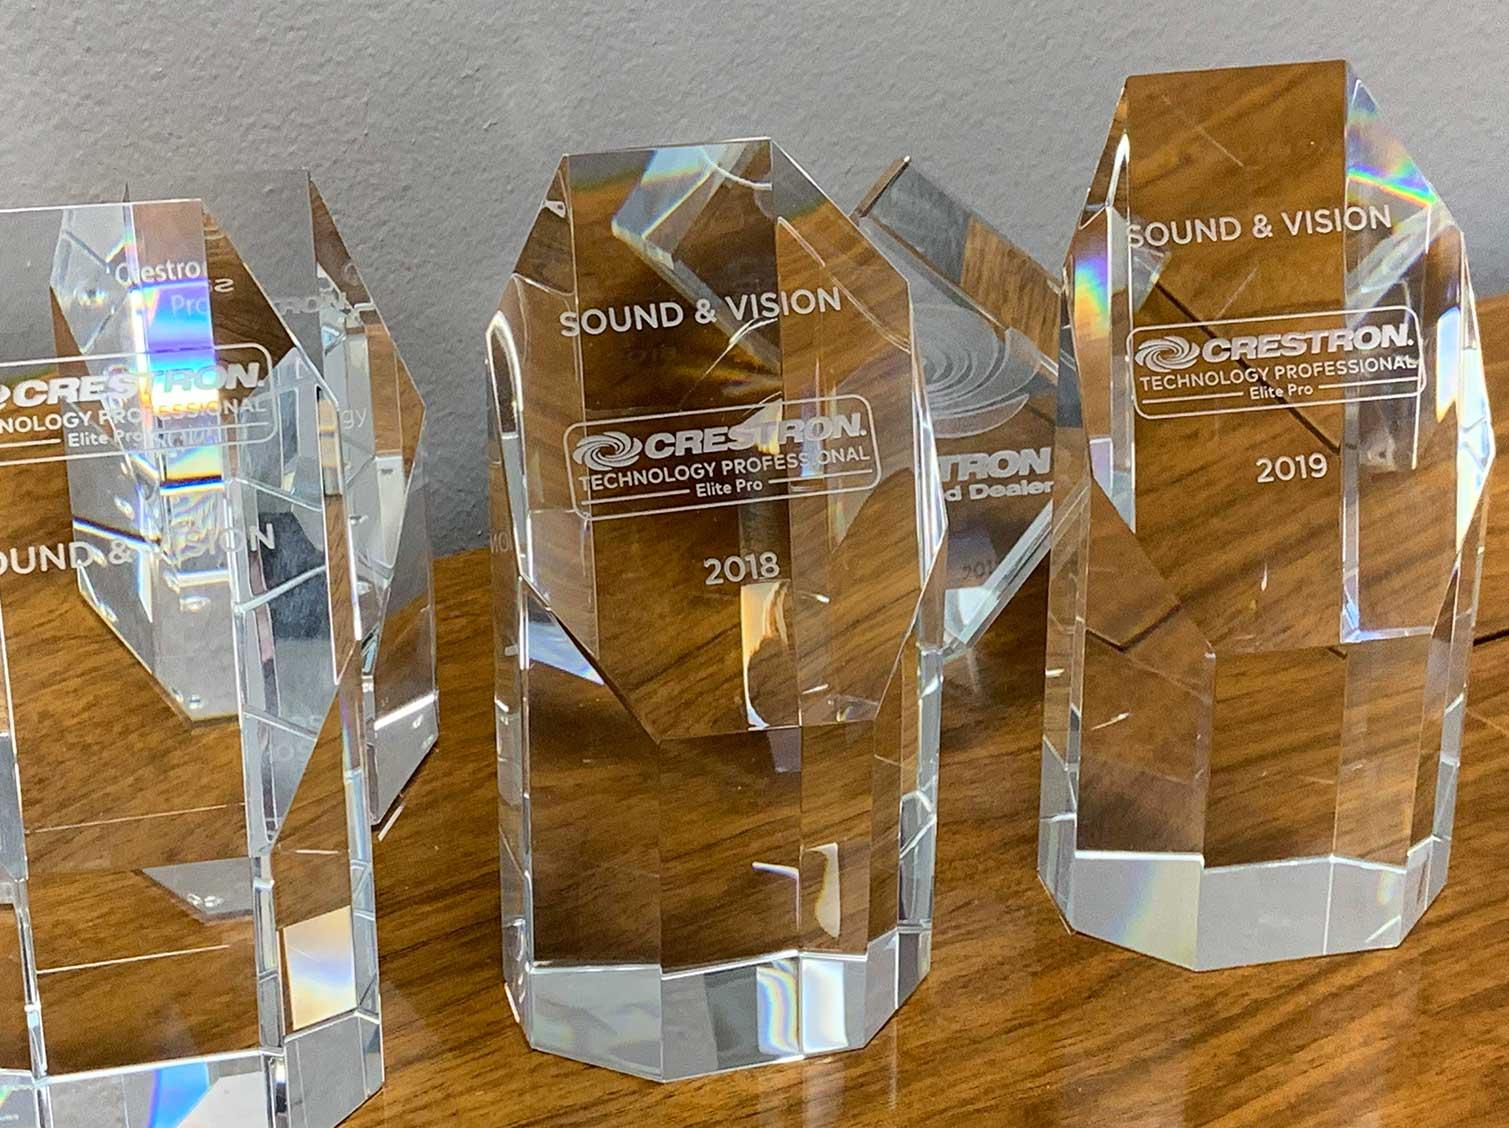 sound-and-vision-elite-pro-awards.jpg